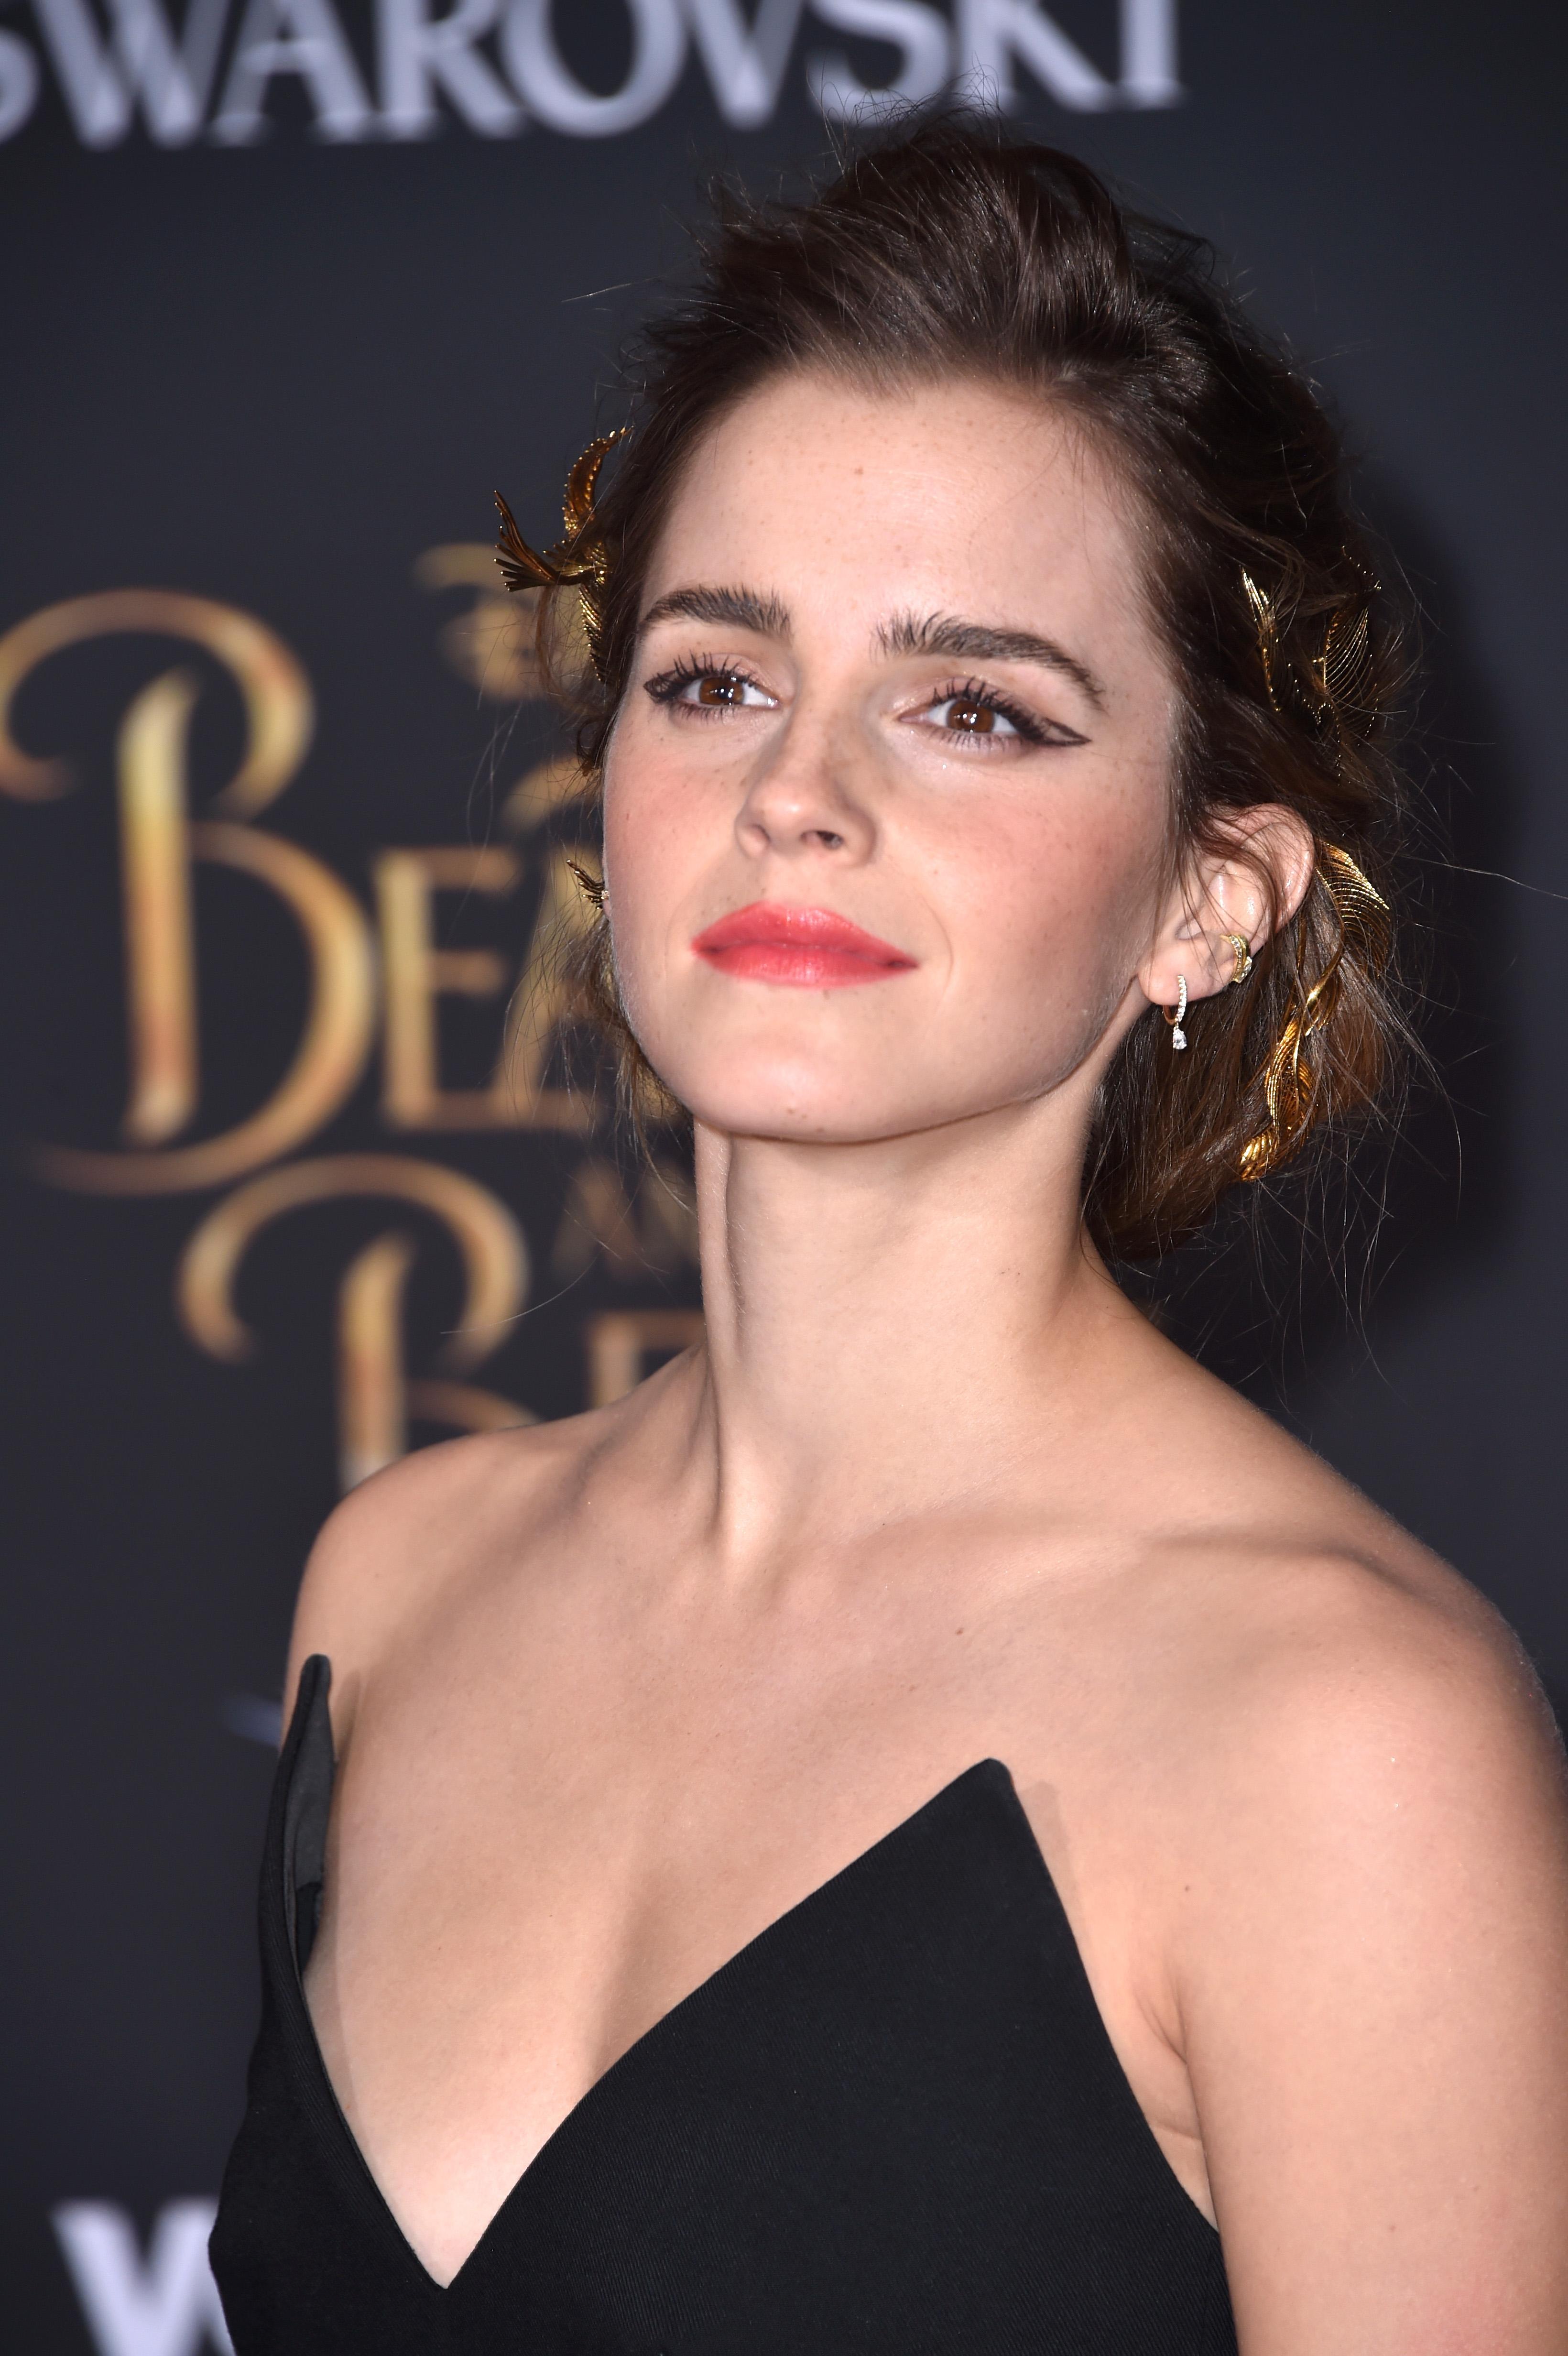 EGO - Emma Watson - Tudo sobre famosos